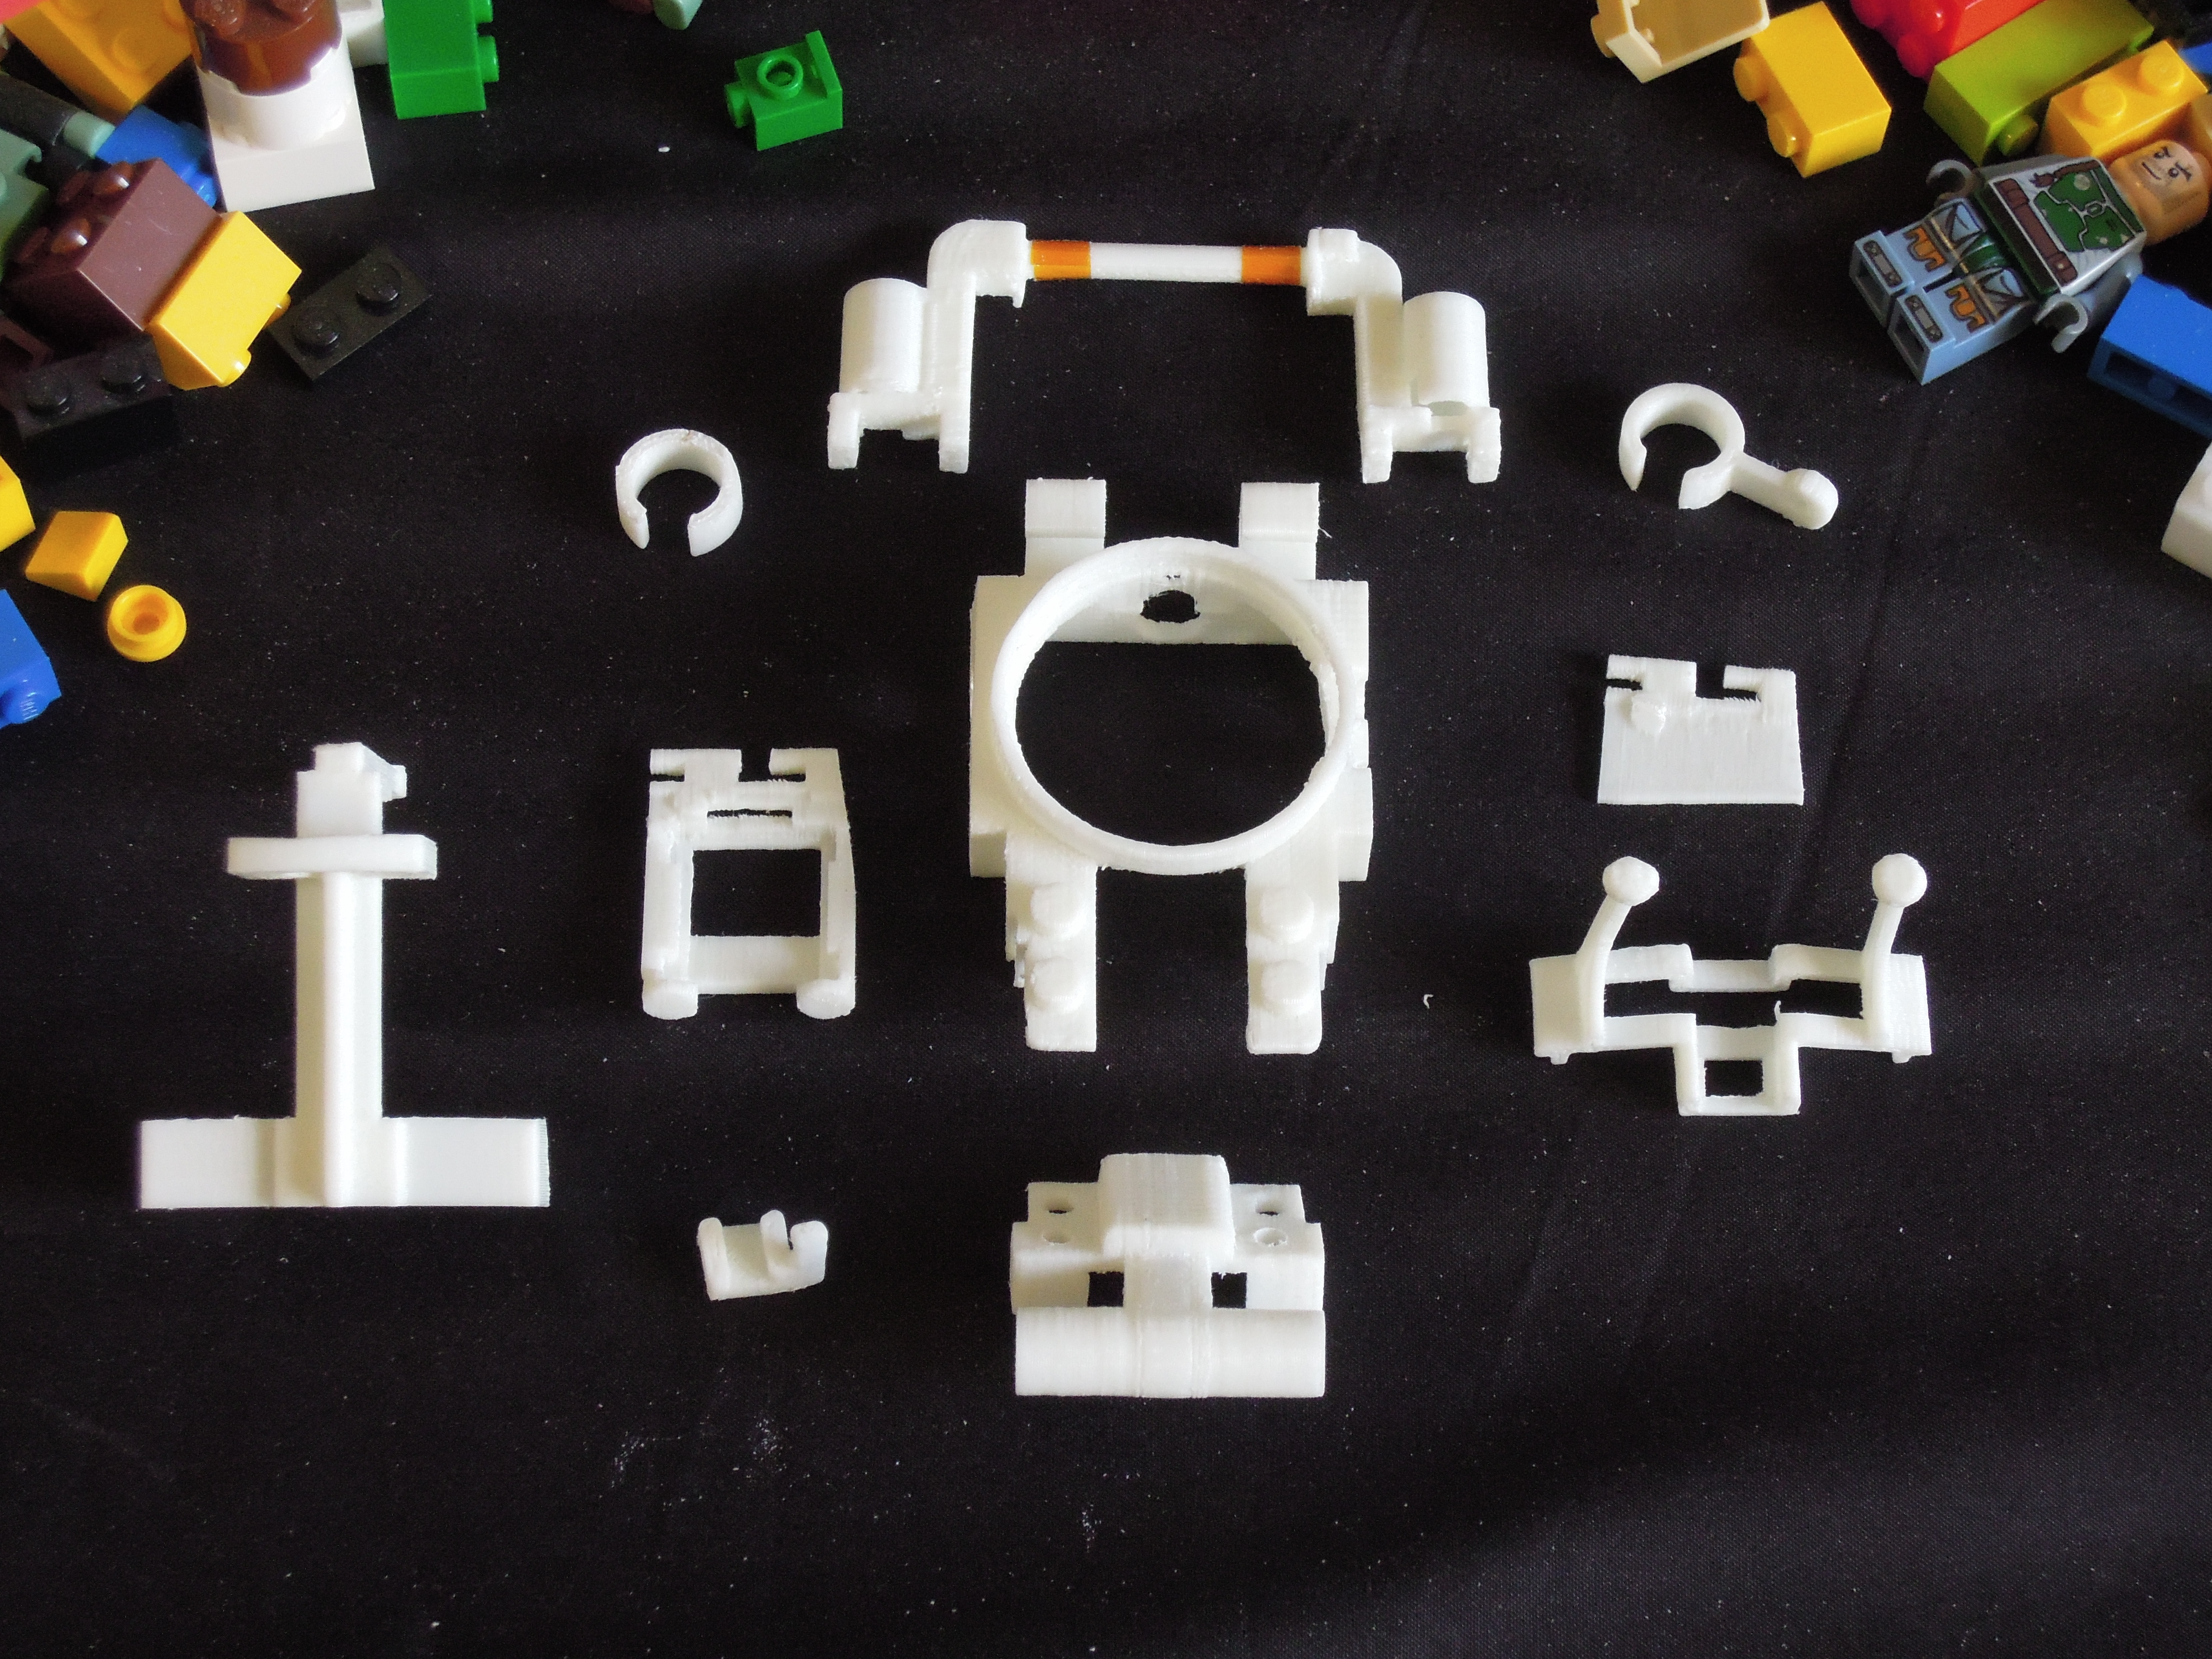 DSCN6471.JPG Download free STL file Small Humanoid Robot • 3D printable design, choimoni